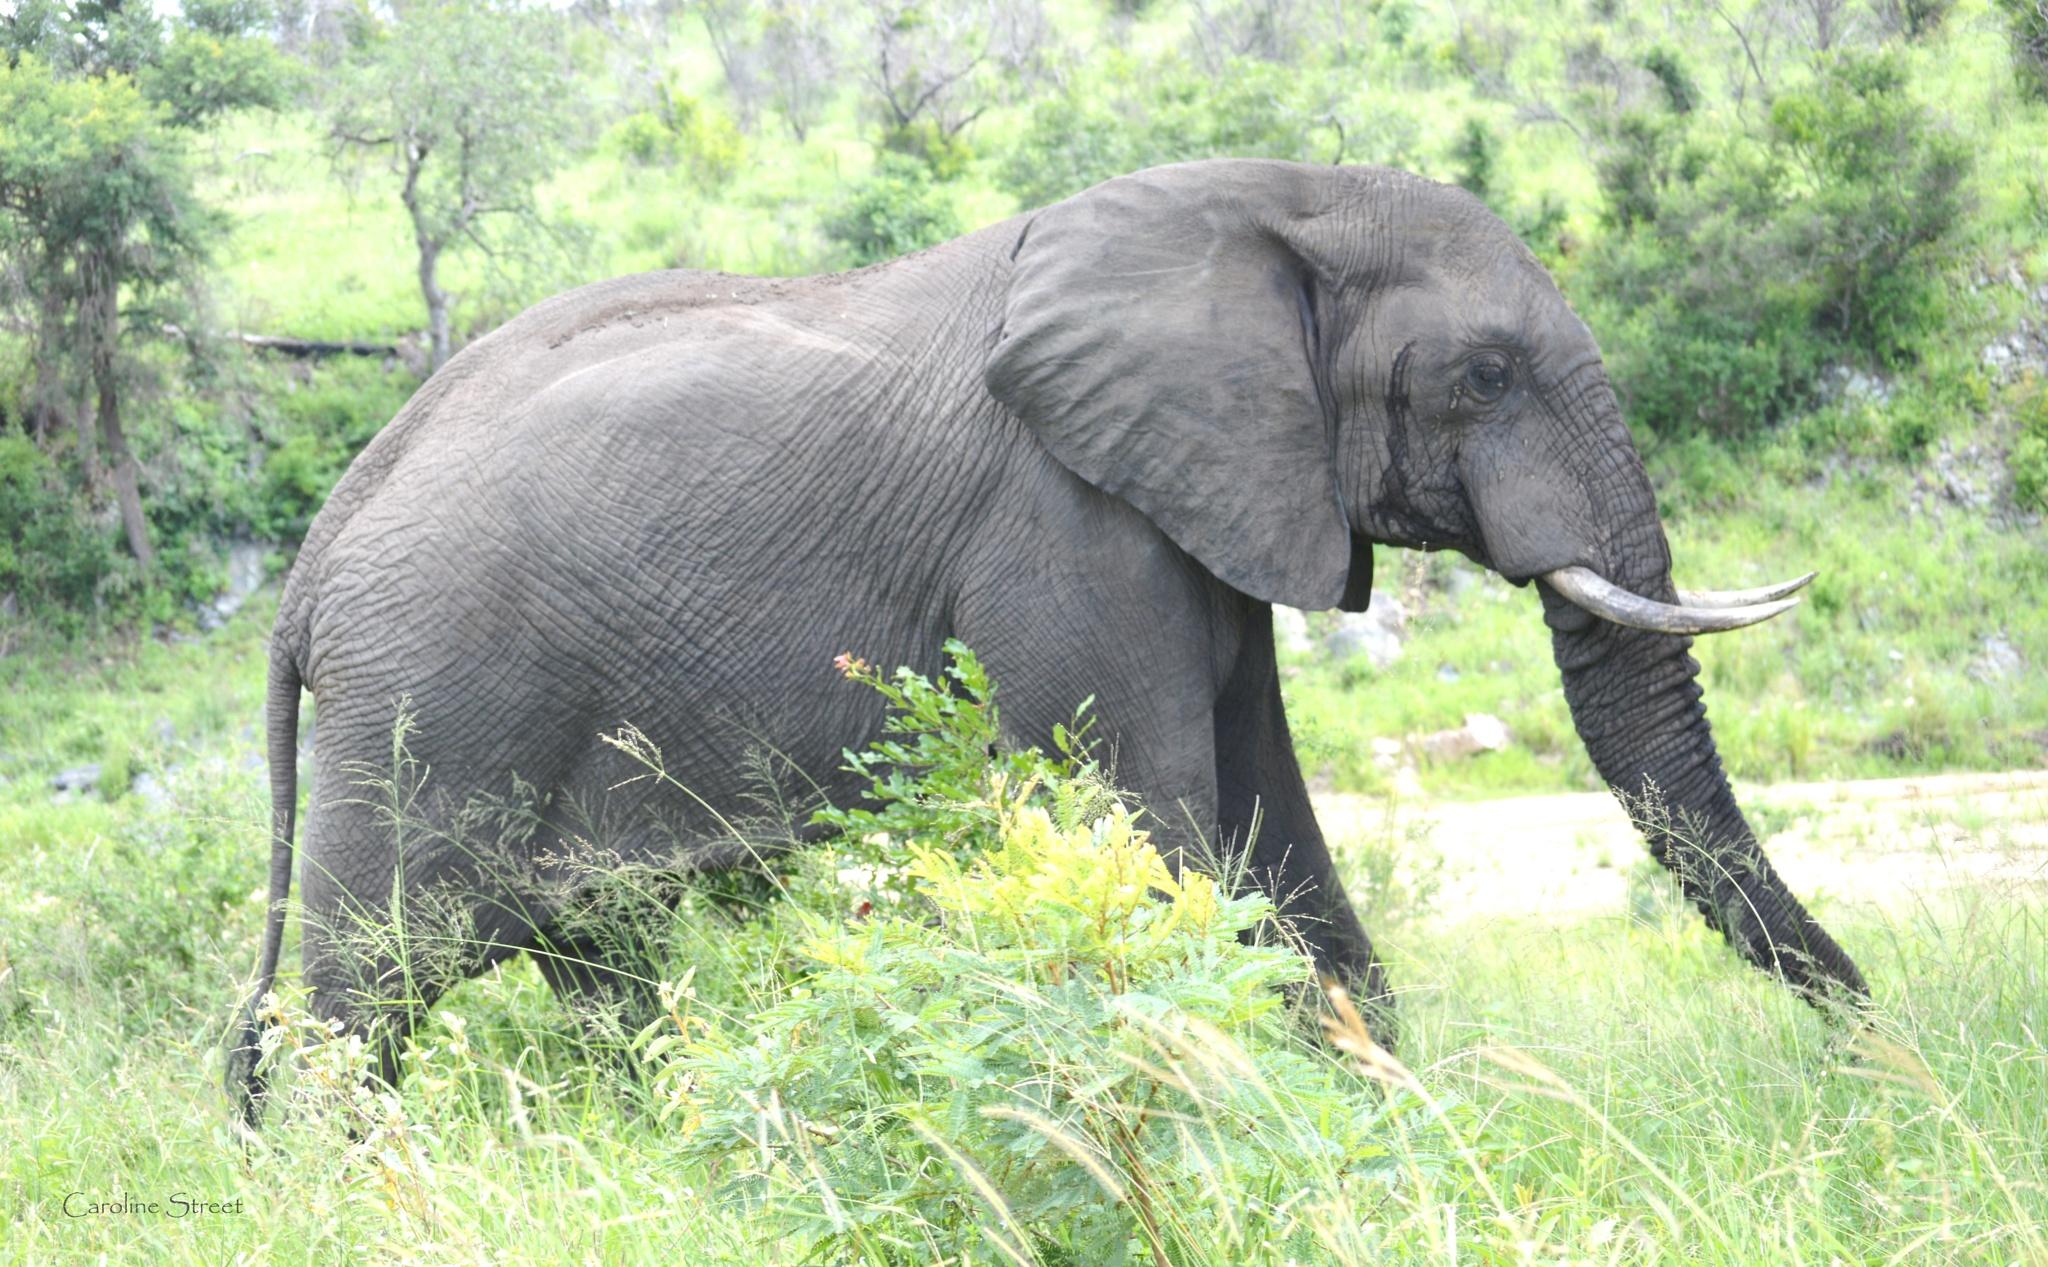 A most gentle beast, the elephant by Caroline Street